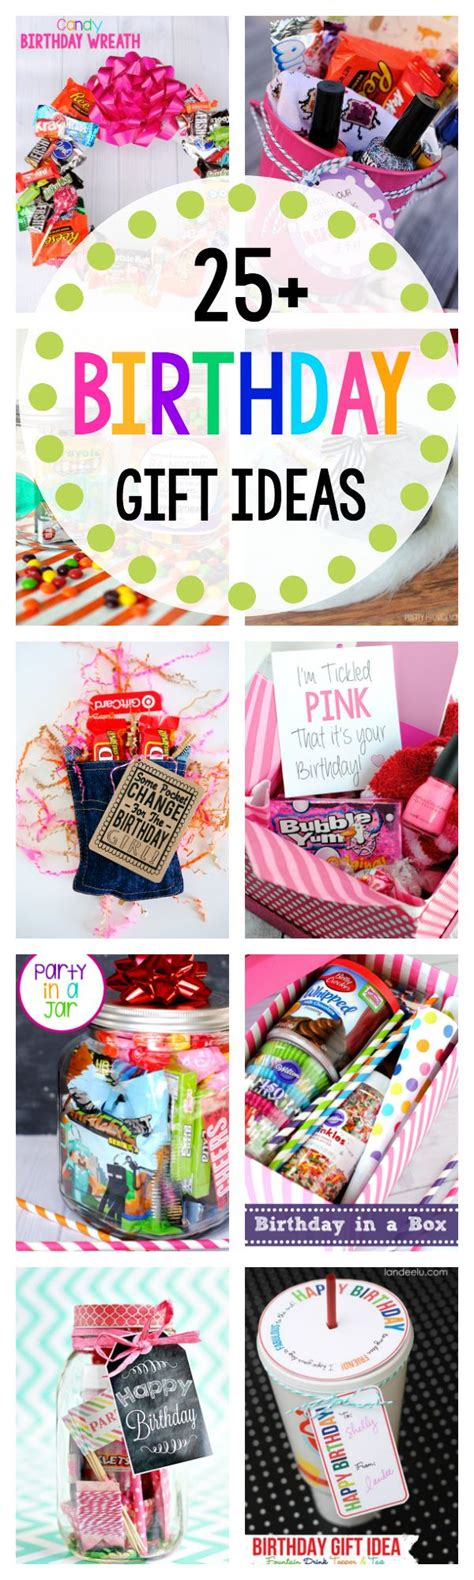 25 best ideas about diy birthday gift on pinterest diy